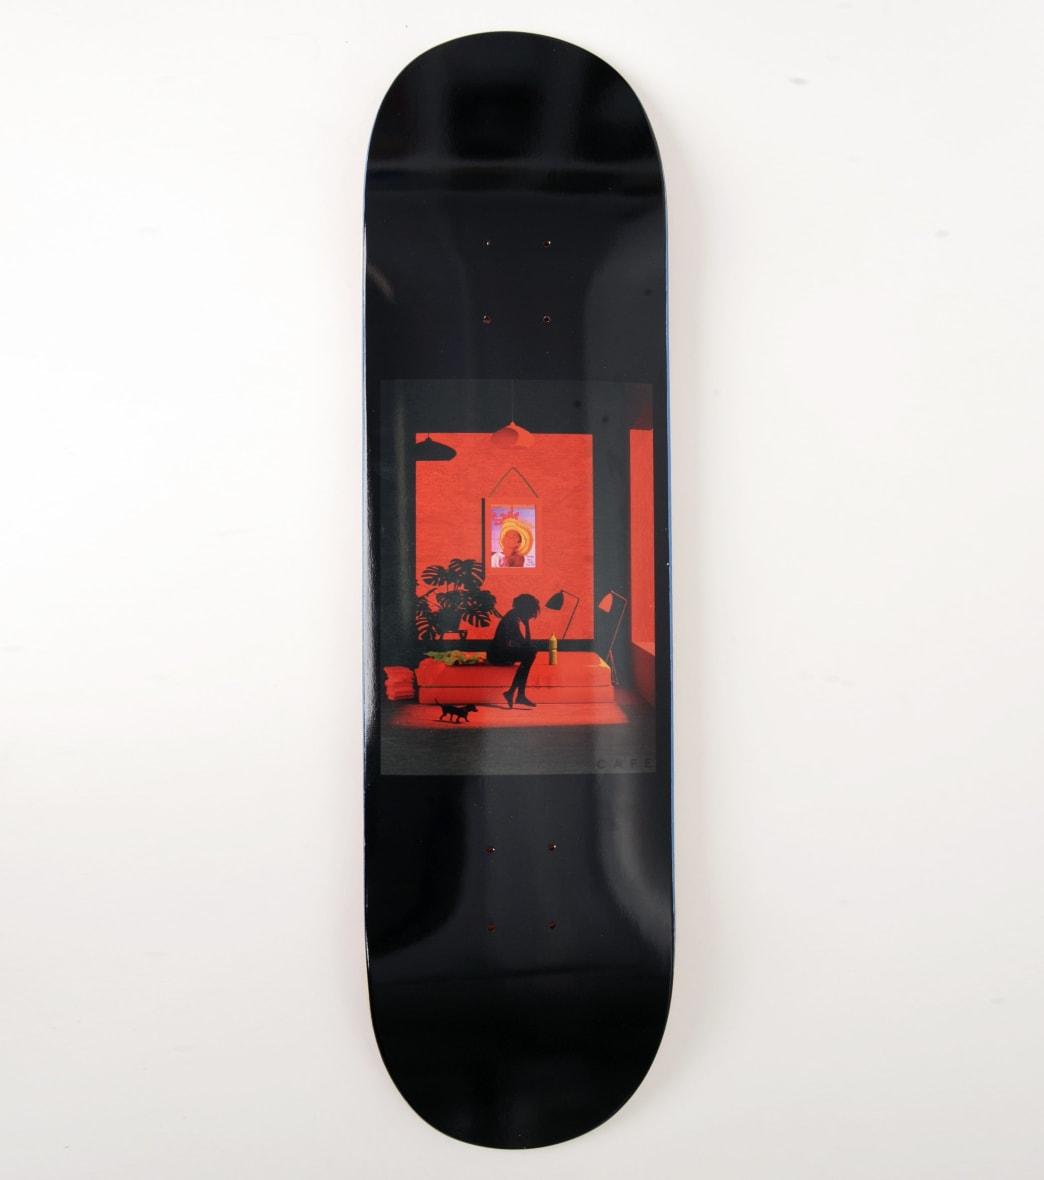 "Skateboard Cafe Liberated Skateboard Deck - 8.5""   Deck by Skateboard Cafe 1"